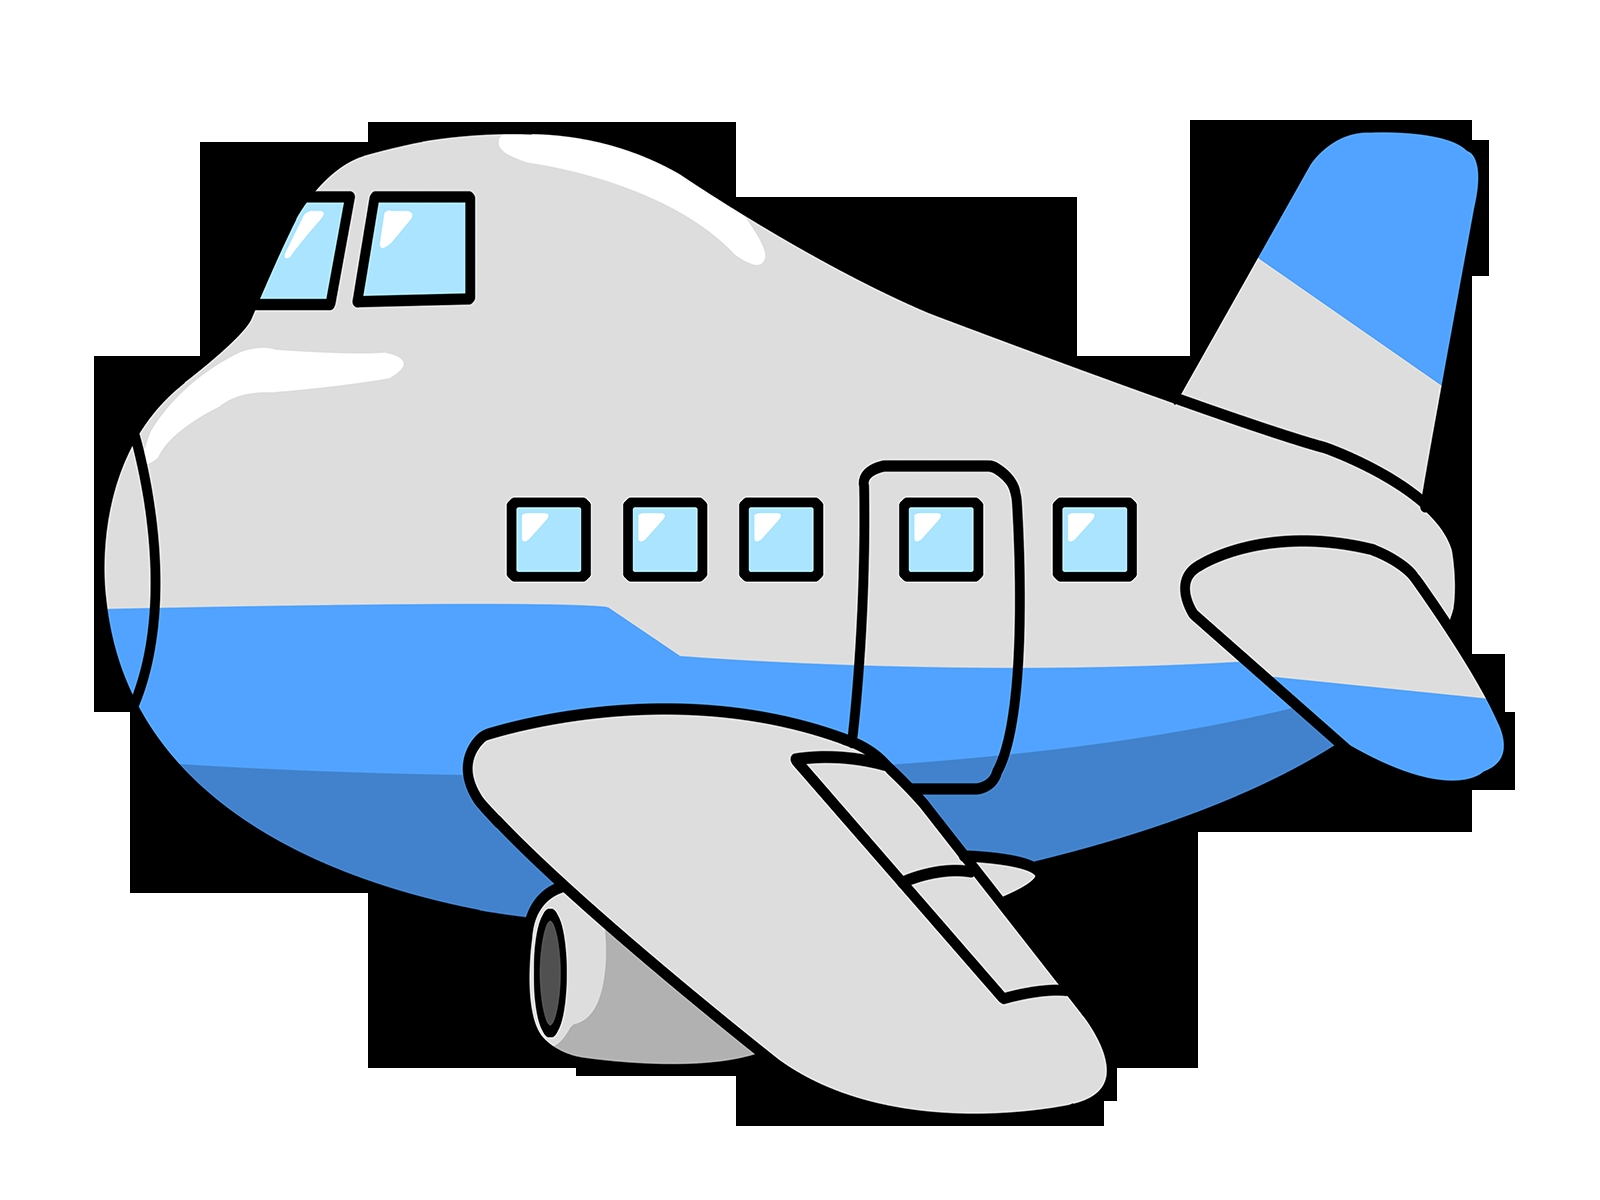 1600x1200 Fresh Airplane Clipart Gallery